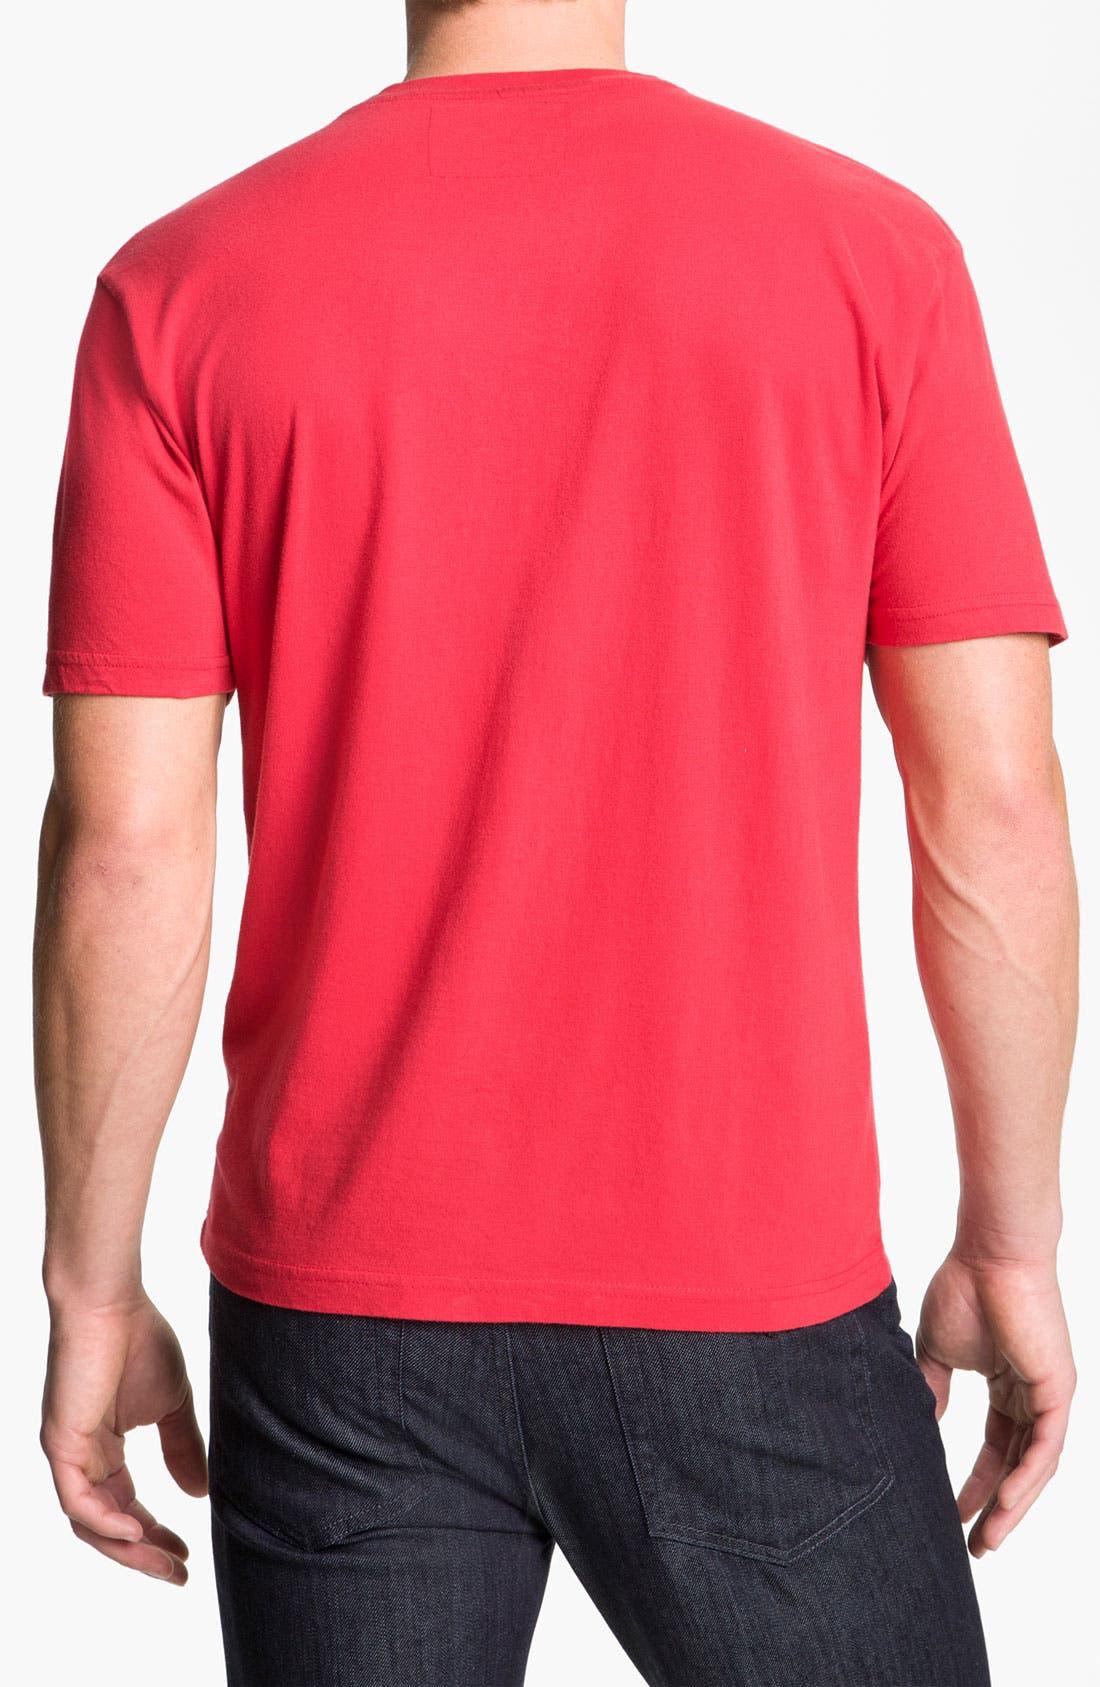 Alternate Image 2  - Wright & Ditson 'St. Louis Cardinals' Baseball T-Shirt